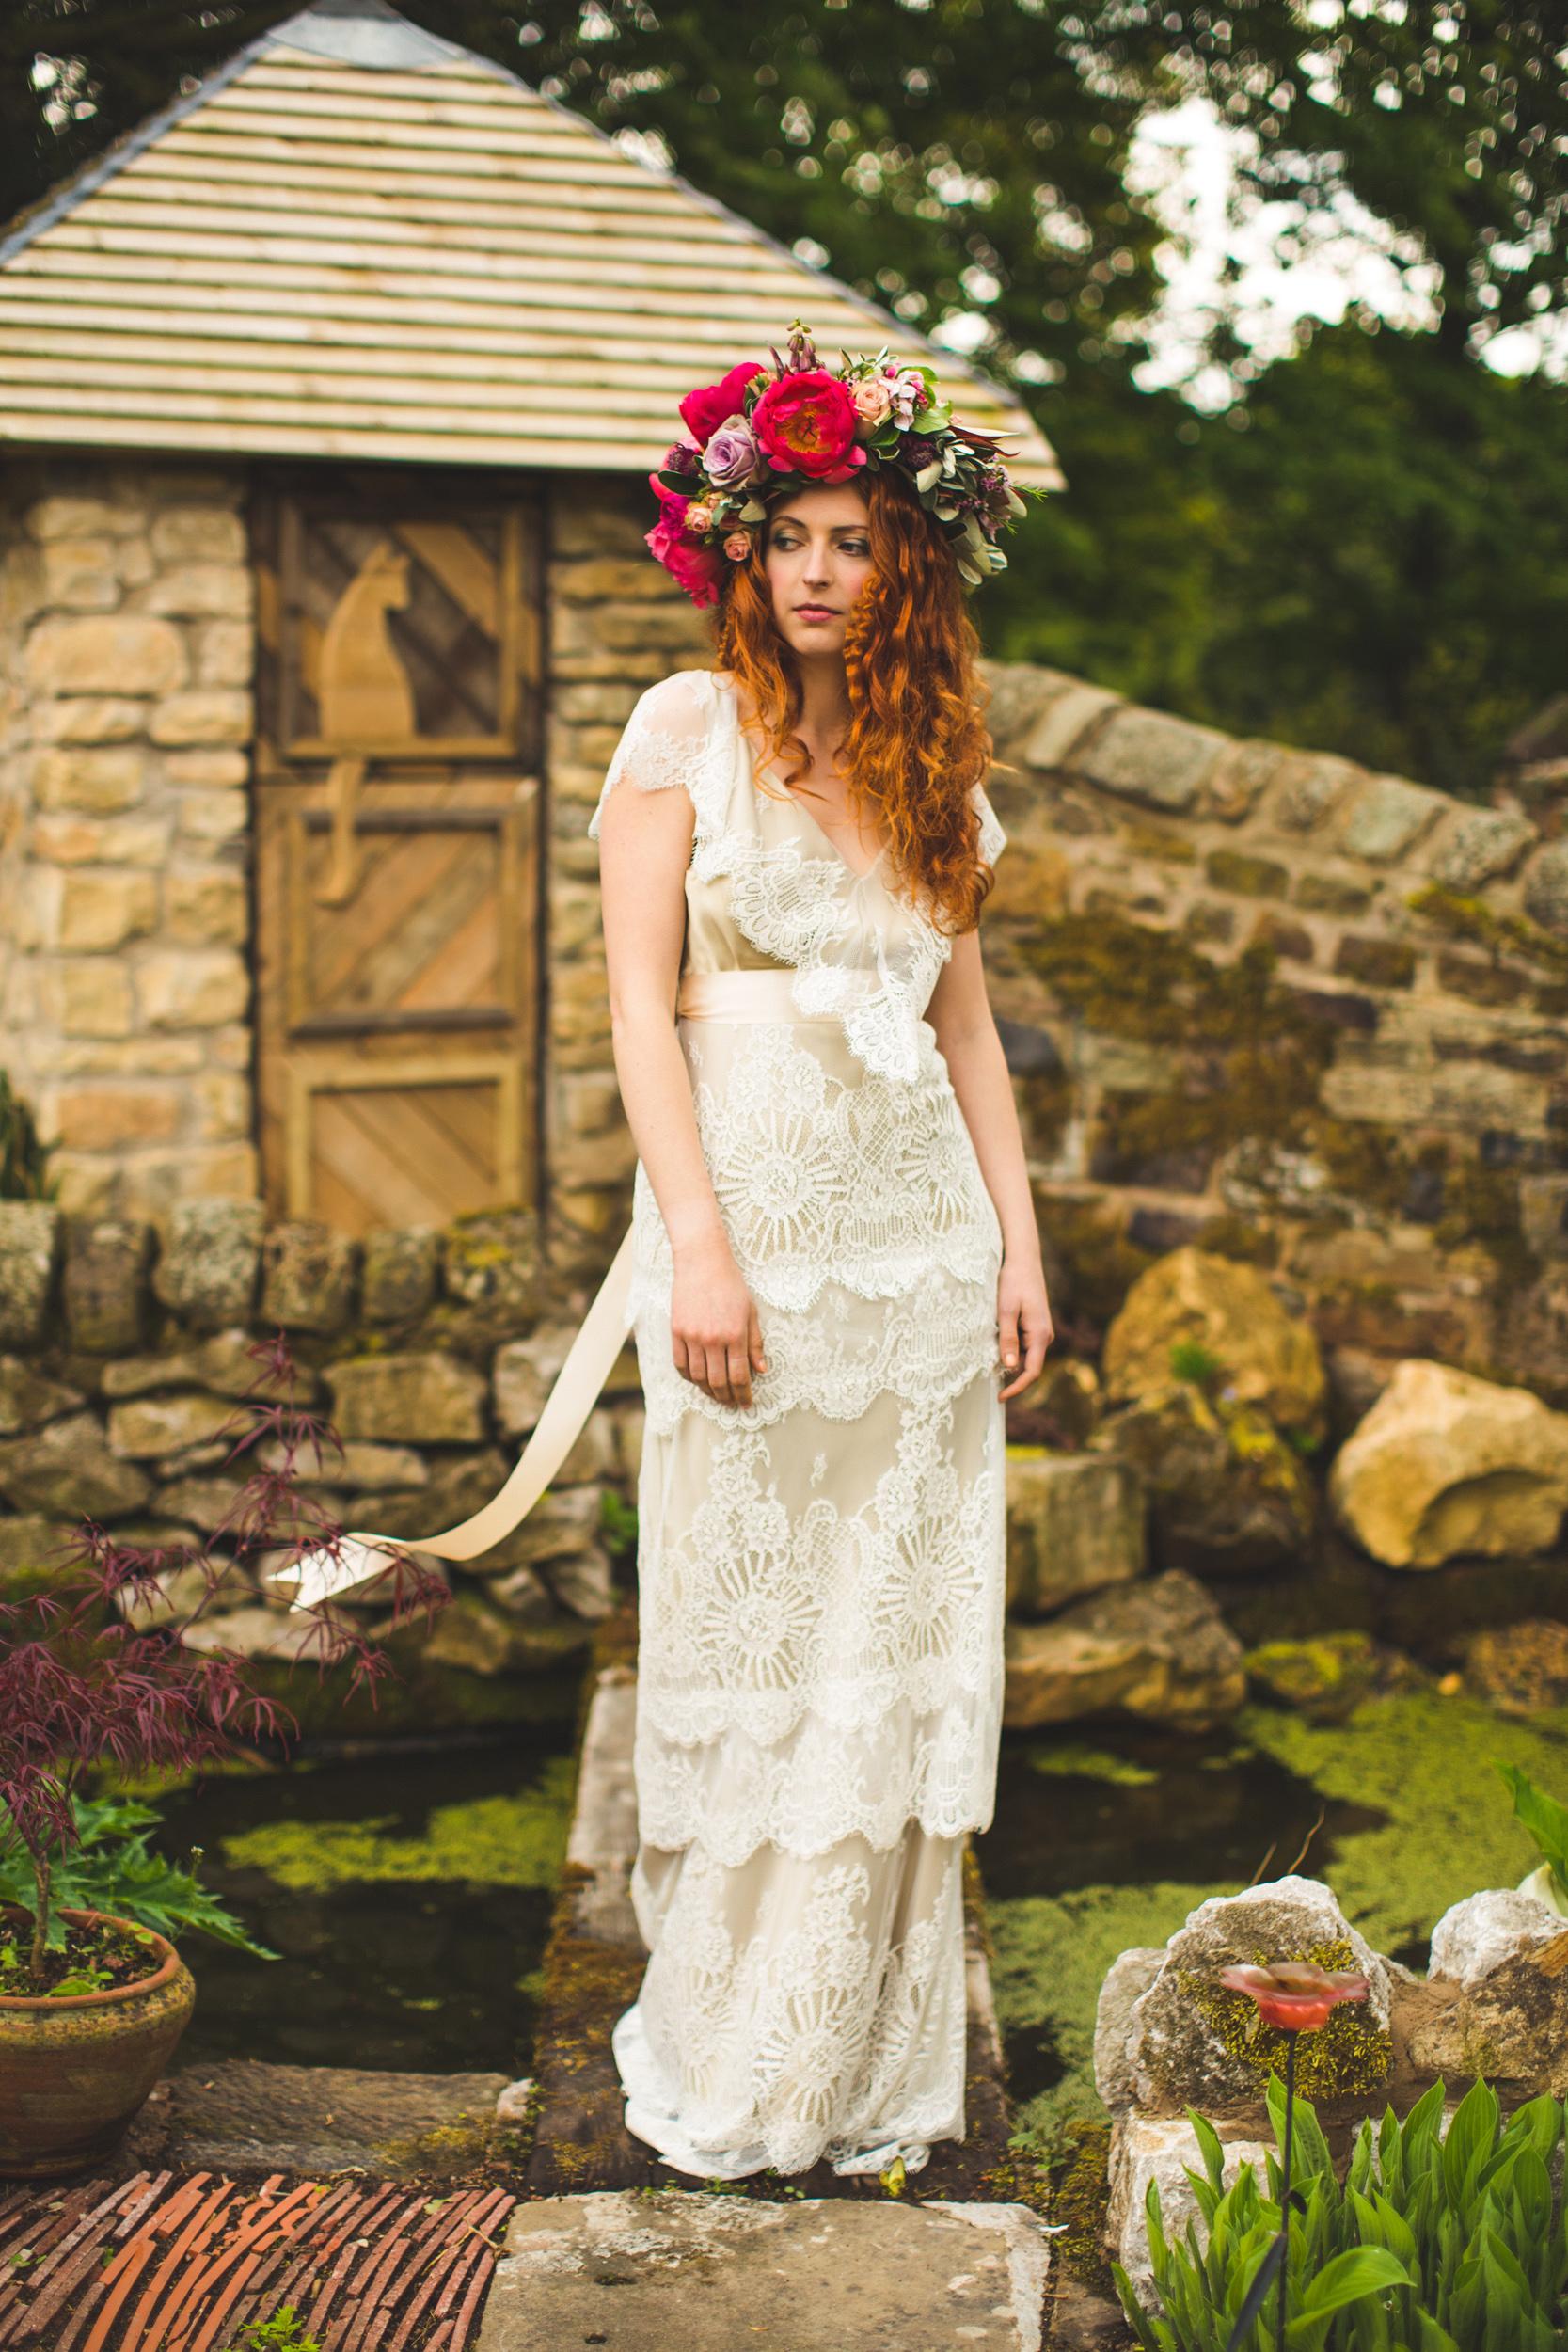 kate-beaumont-vintage-inspired-bridal-wedding-dresses-Sheffield-S6-10.jpg